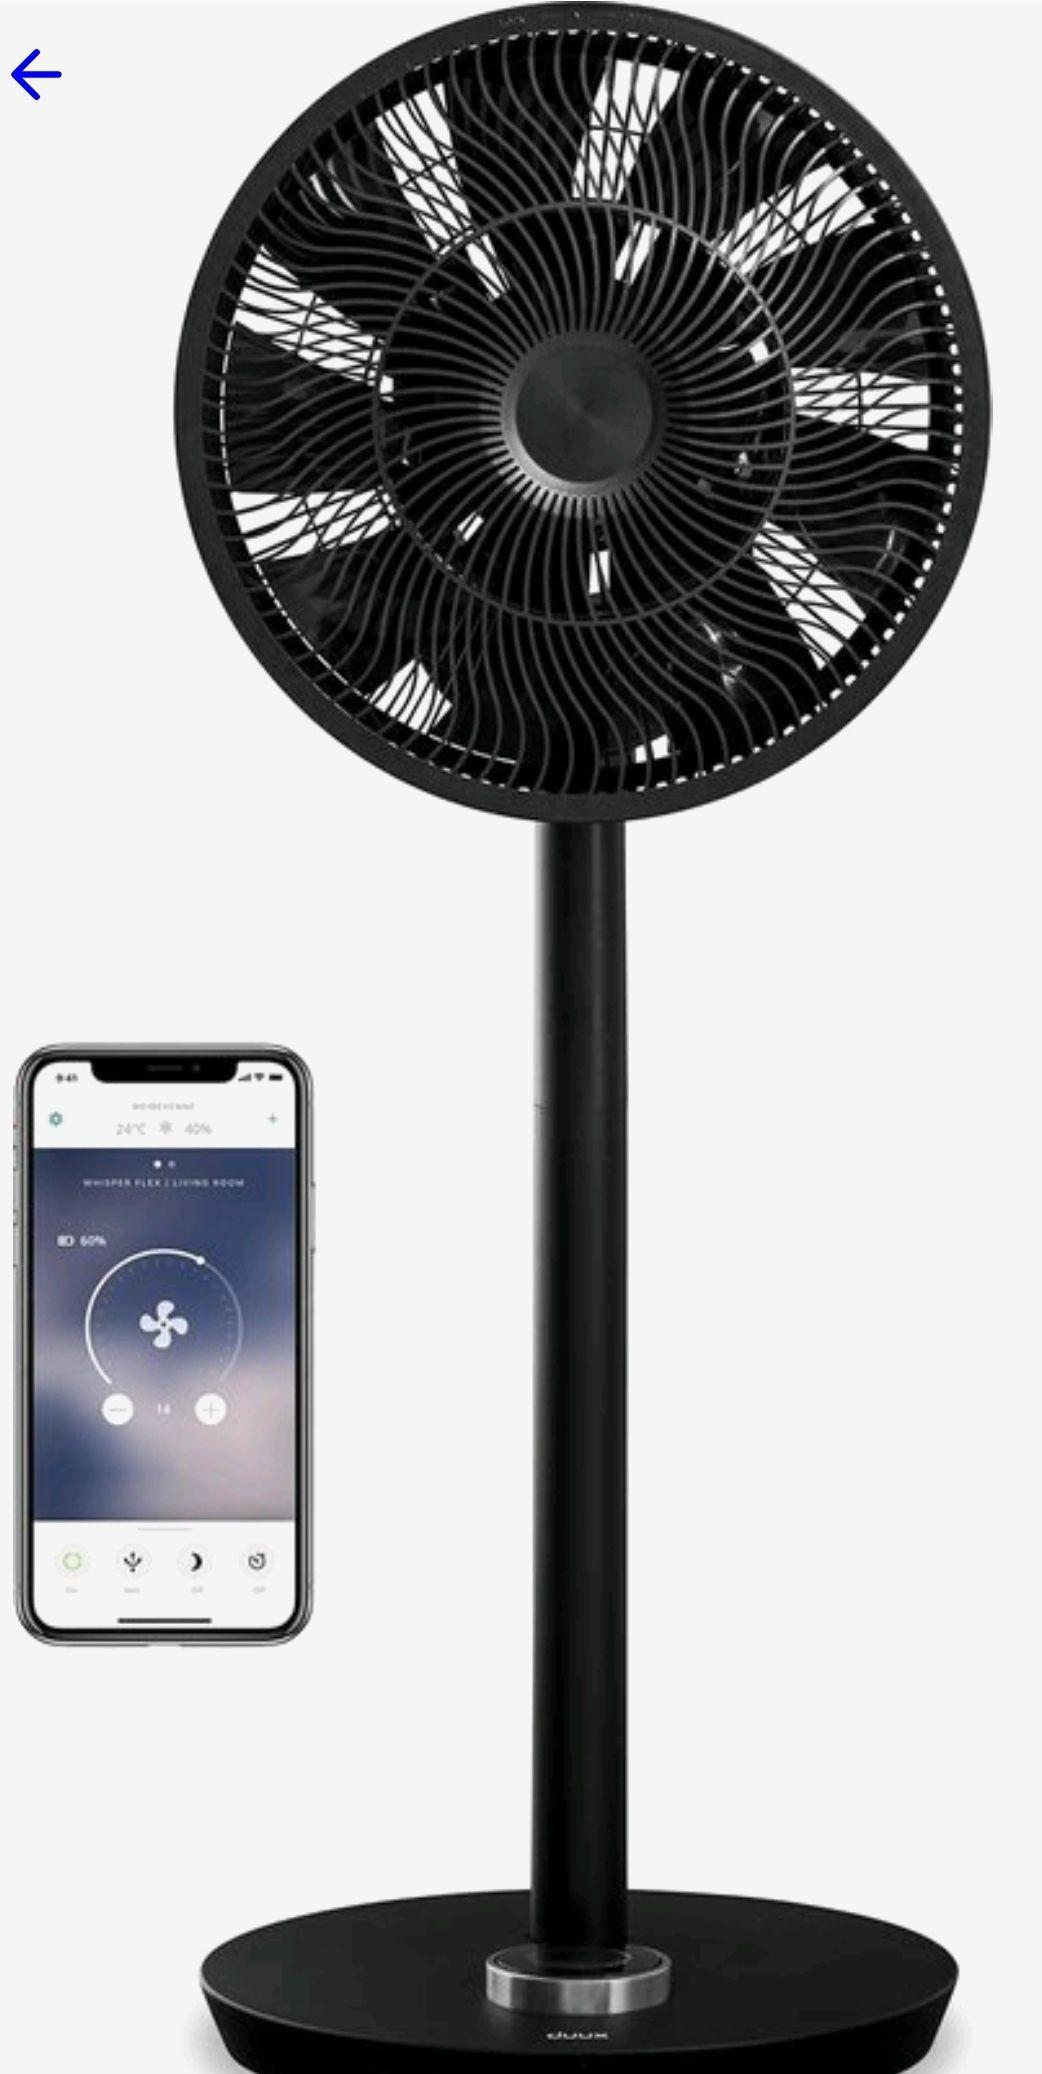 duux whisper flex smart ventilator